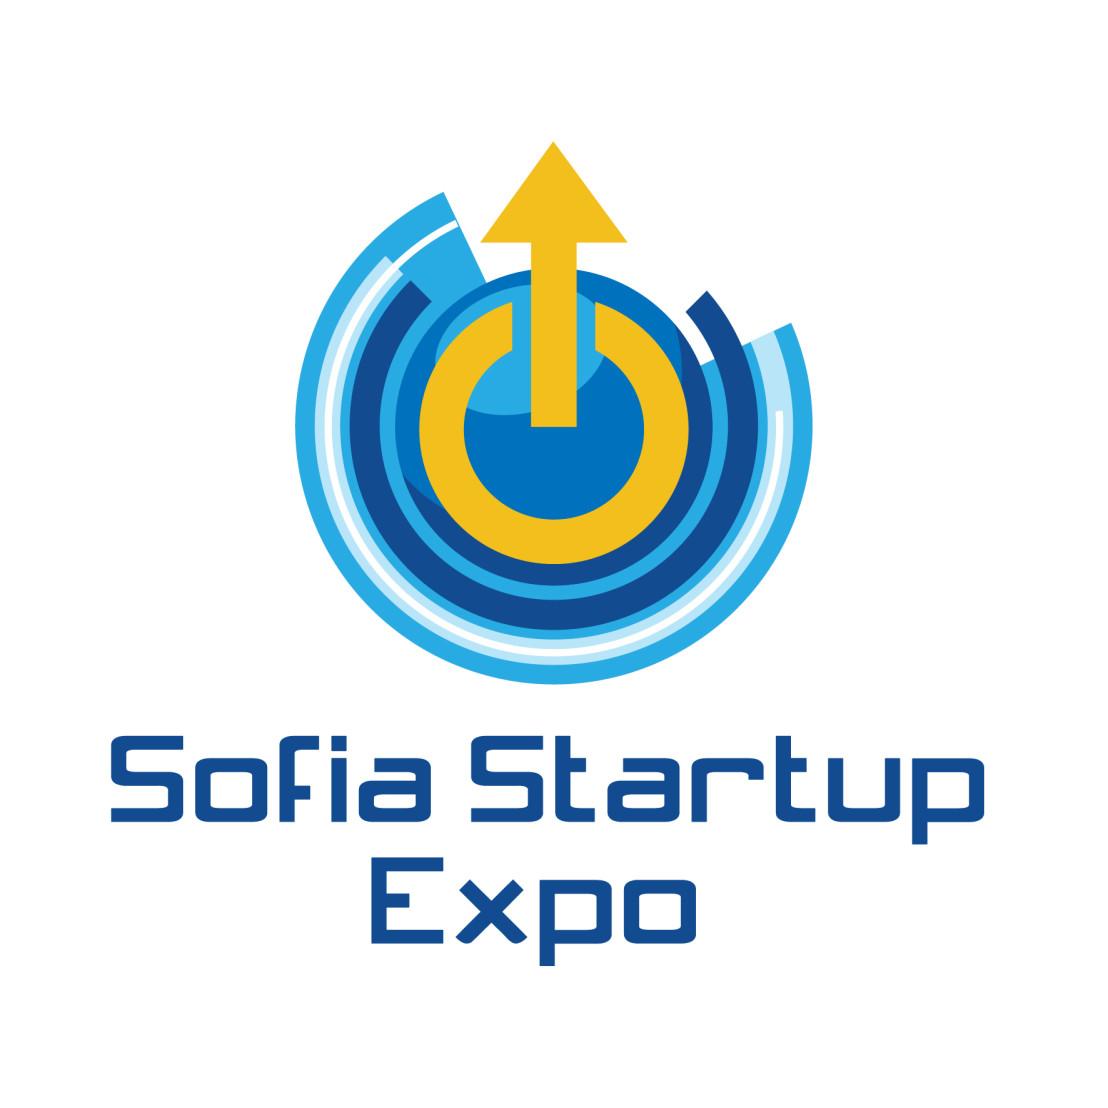 Sofia Startup Expo